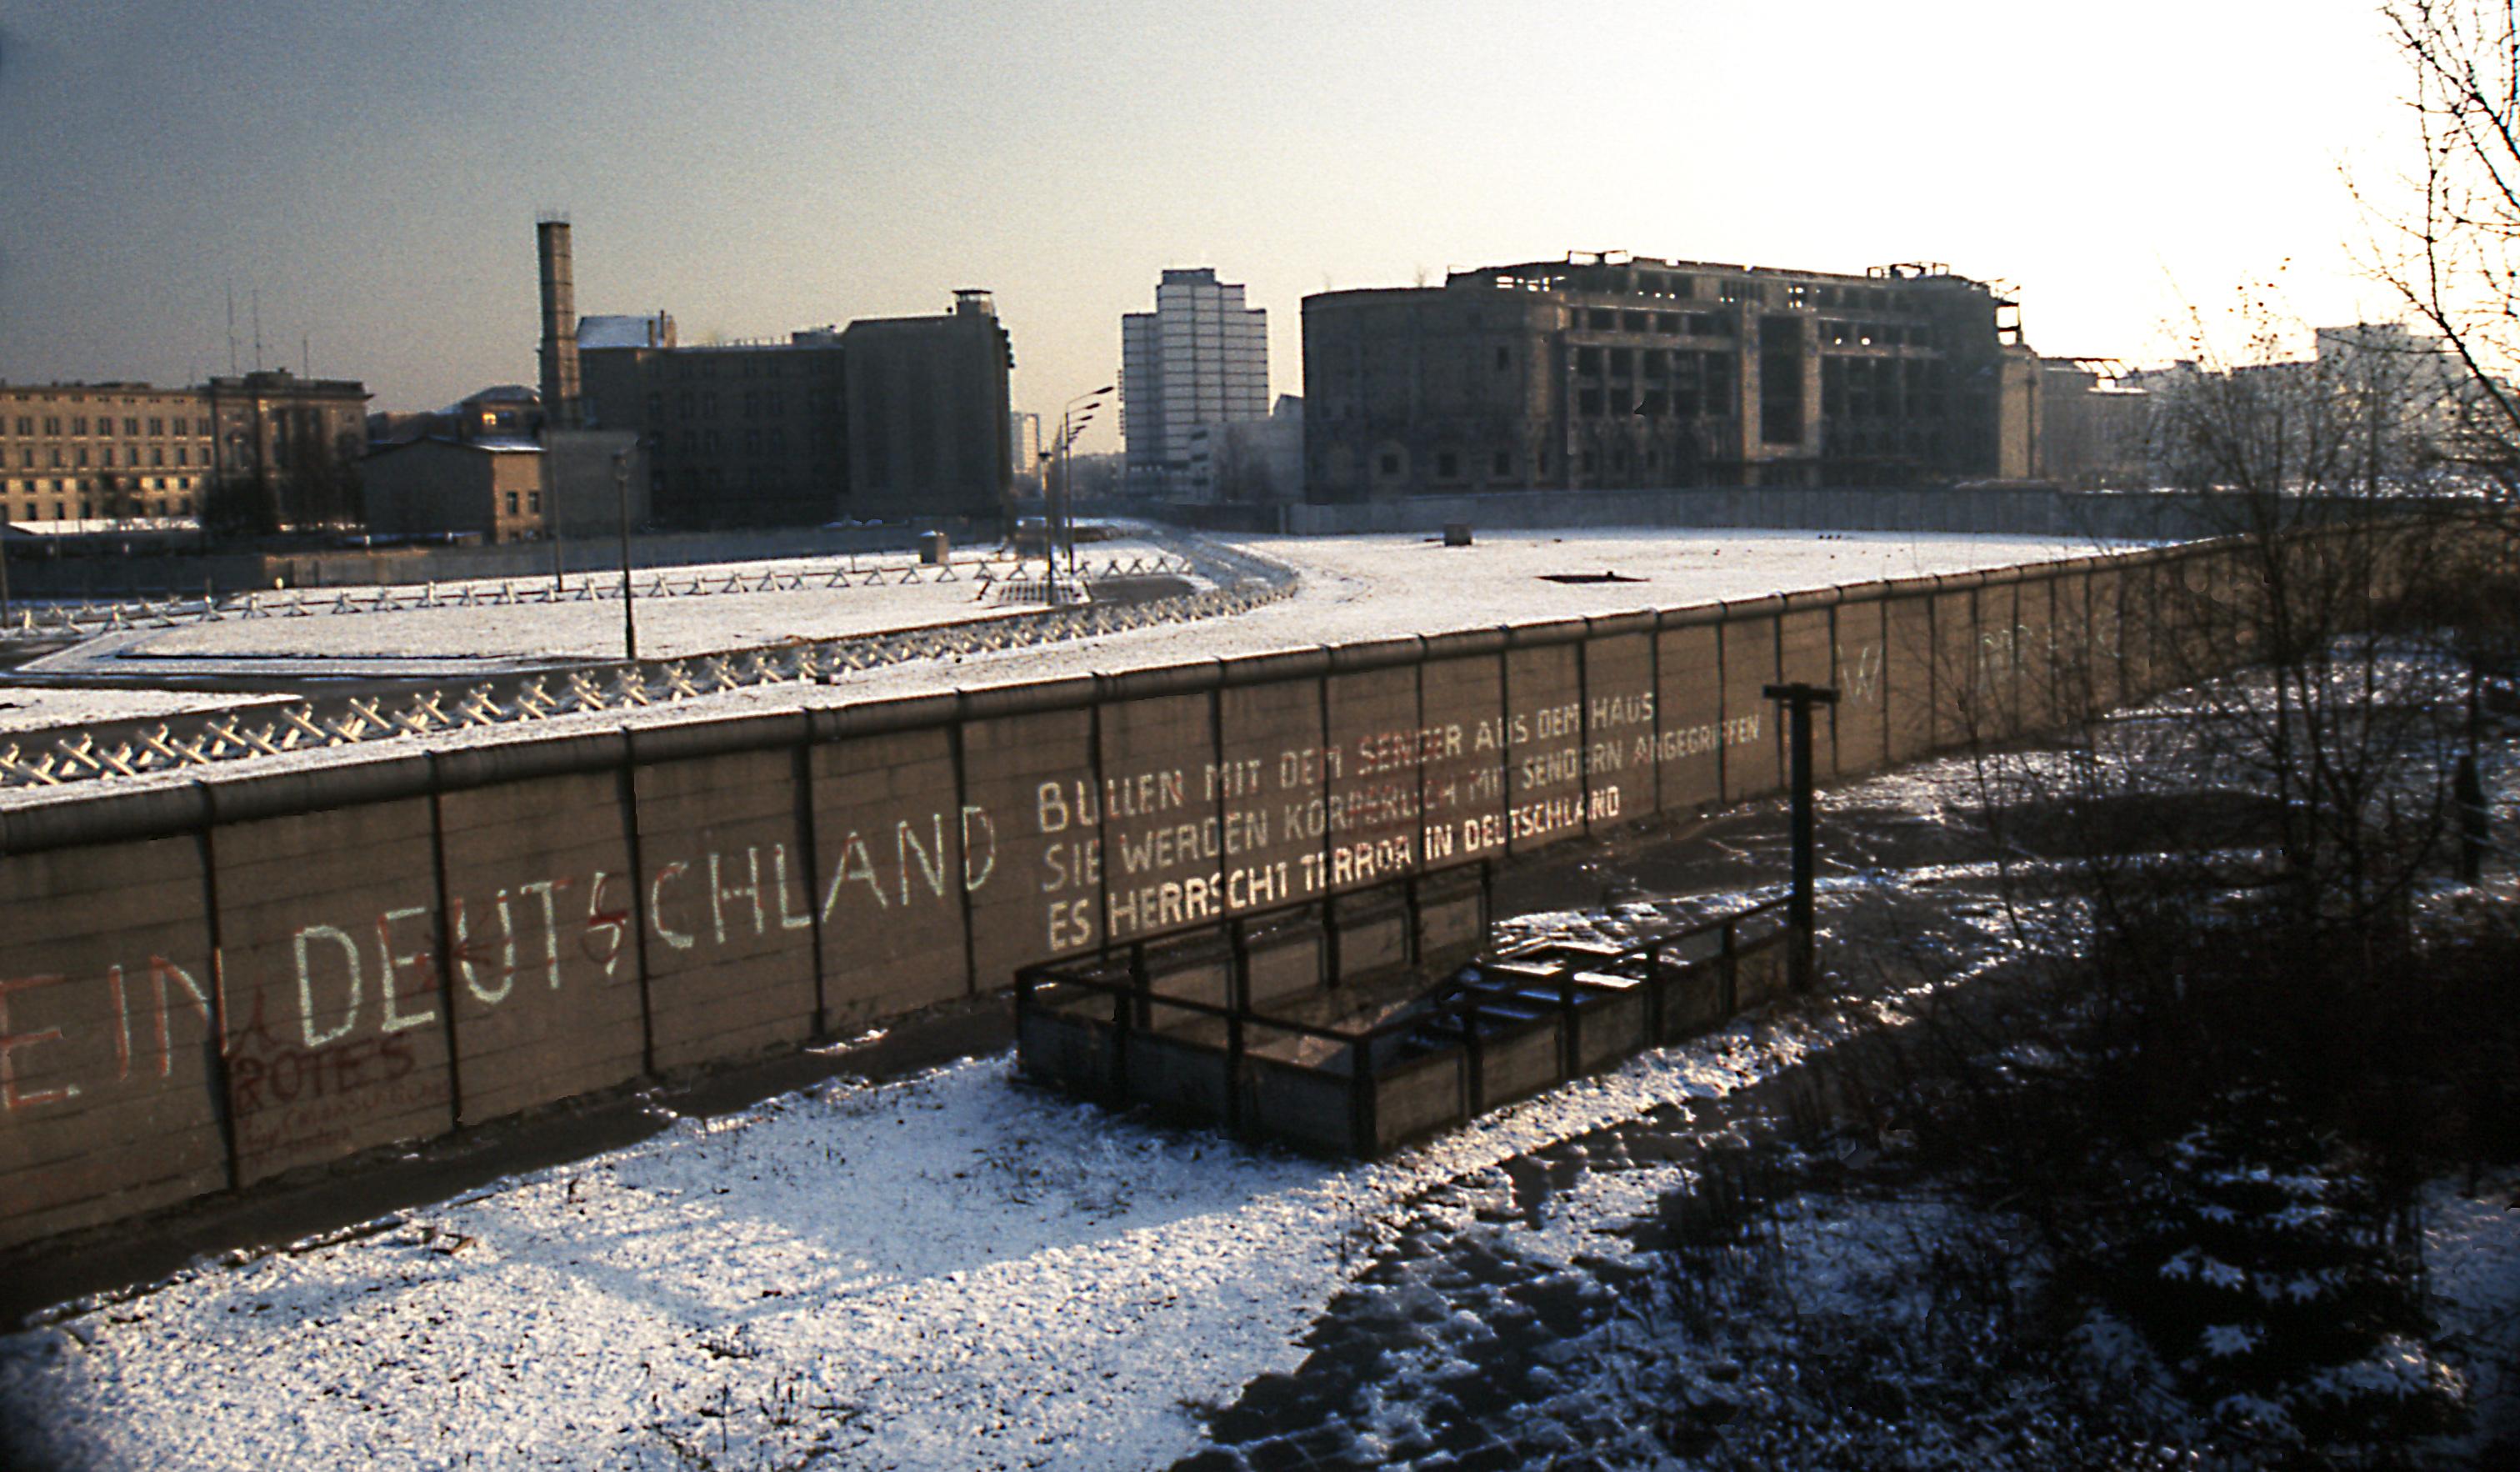 https://upload.wikimedia.org/wikipedia/commons/a/af/Berlin_Wall_Potsdamer_Platz_November_1975_looking_east.jpg